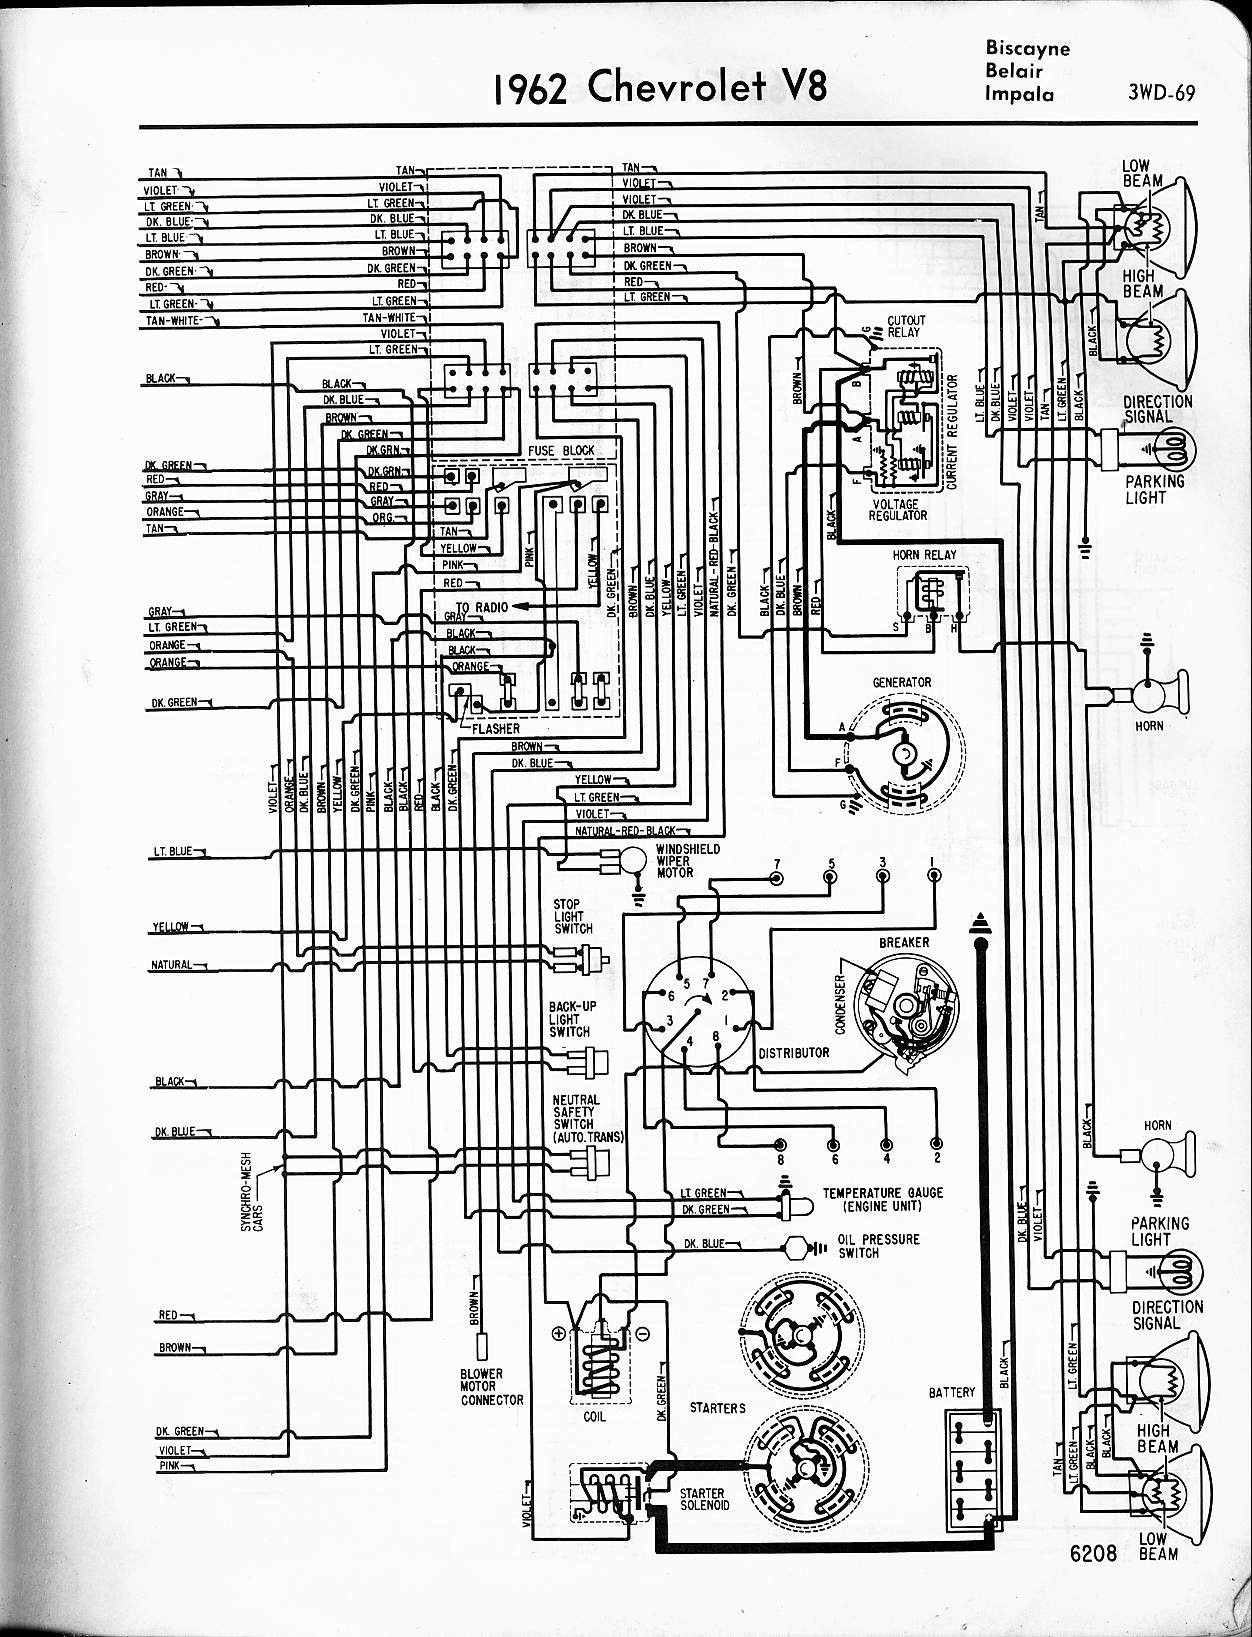 hight resolution of 1962 chevrolet impala starter wiring wiring diagram 1963 chevrolet impala interior 1962 chevrolet impala starter wiring